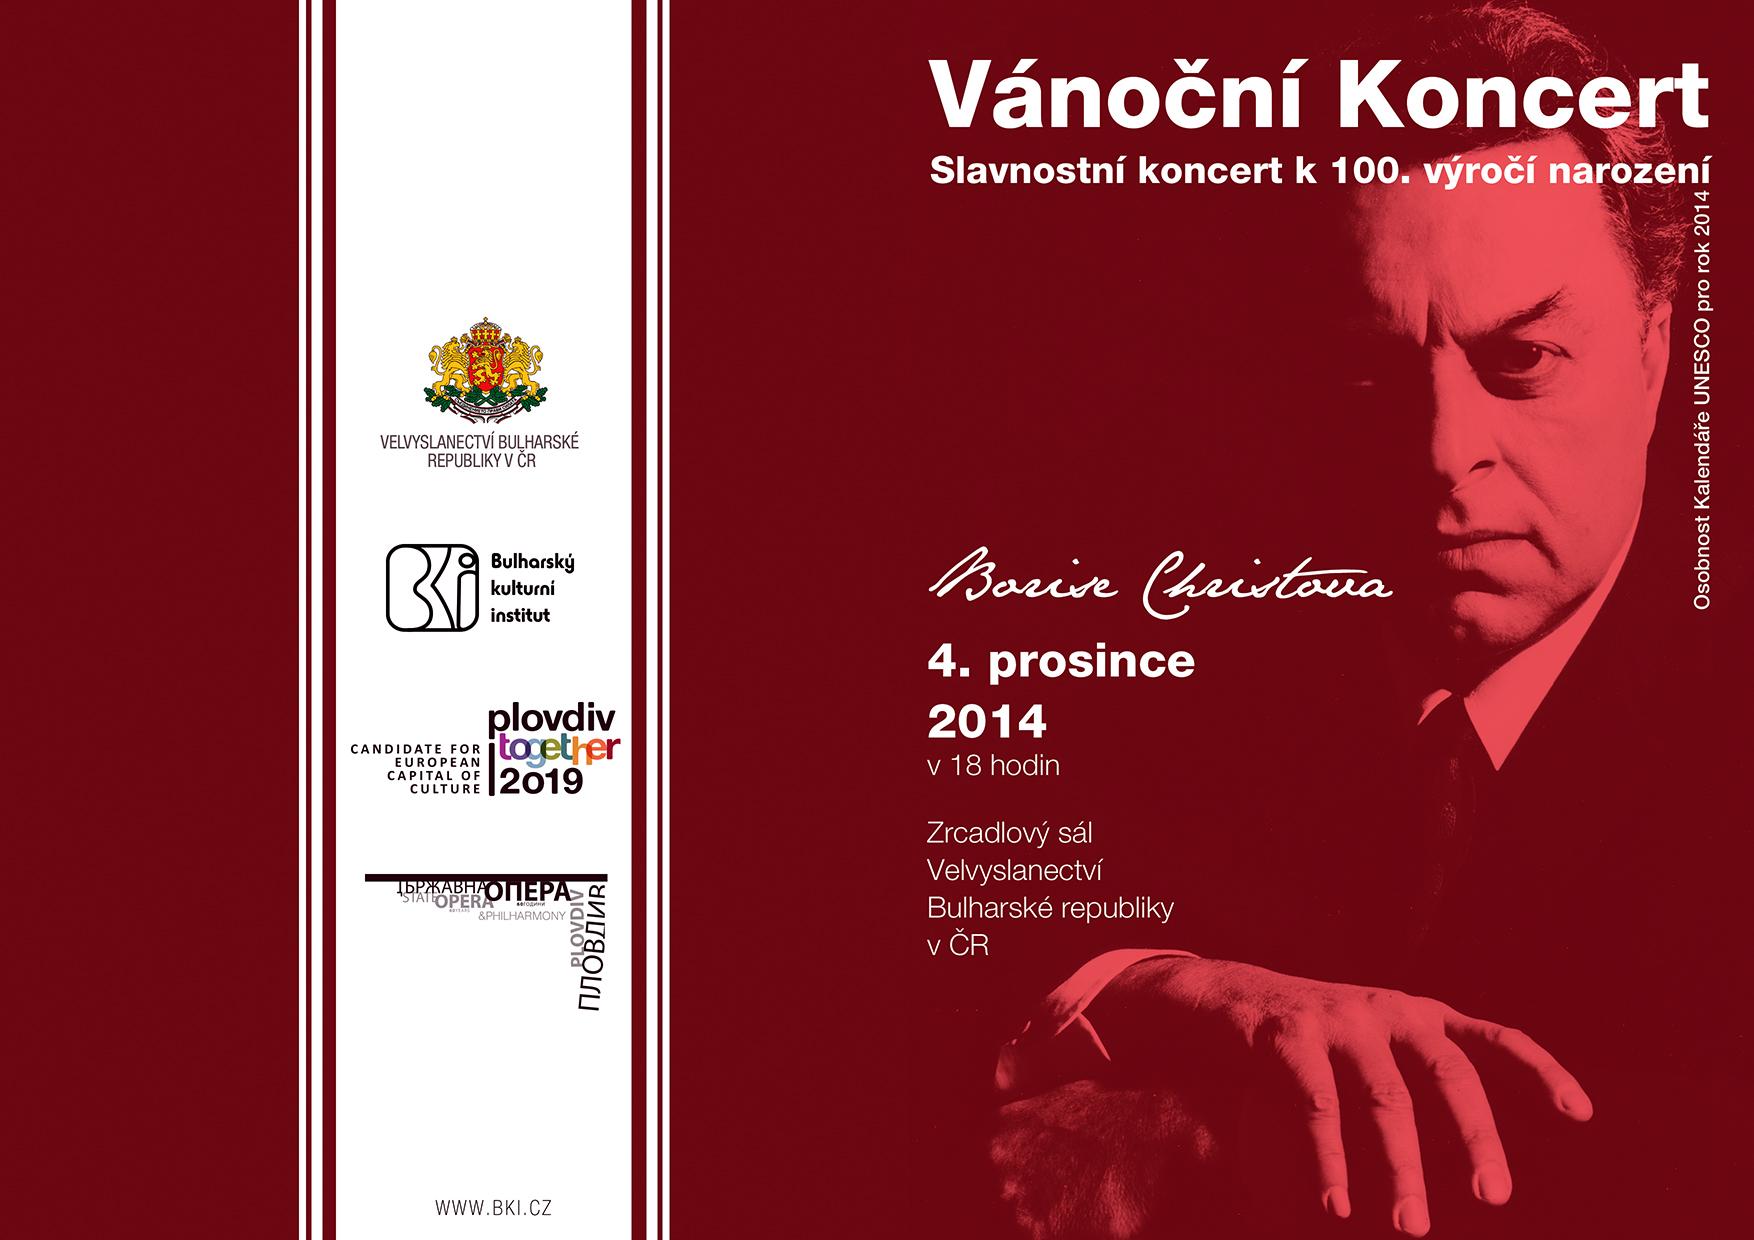 Pozvanka Vanocni koncert Boris Christov